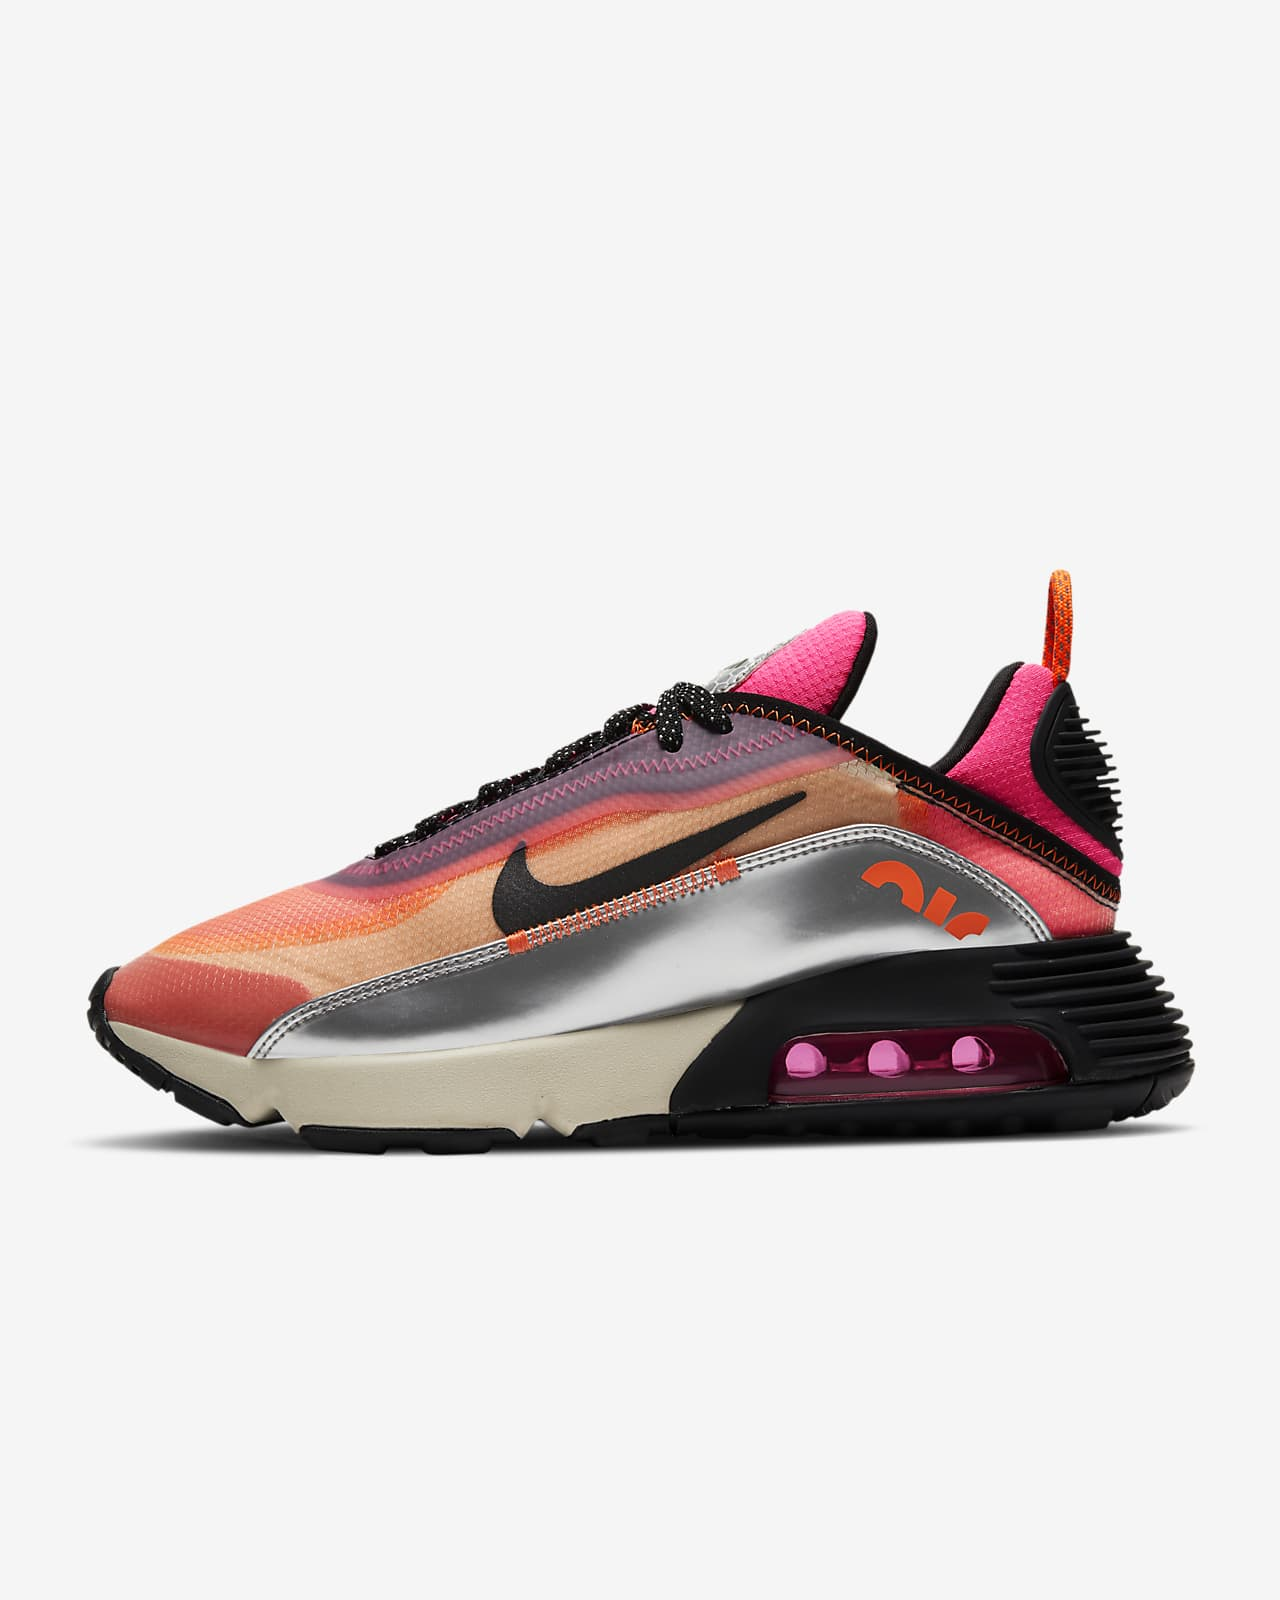 Nike Air Max 2090 SE Women's Shoe